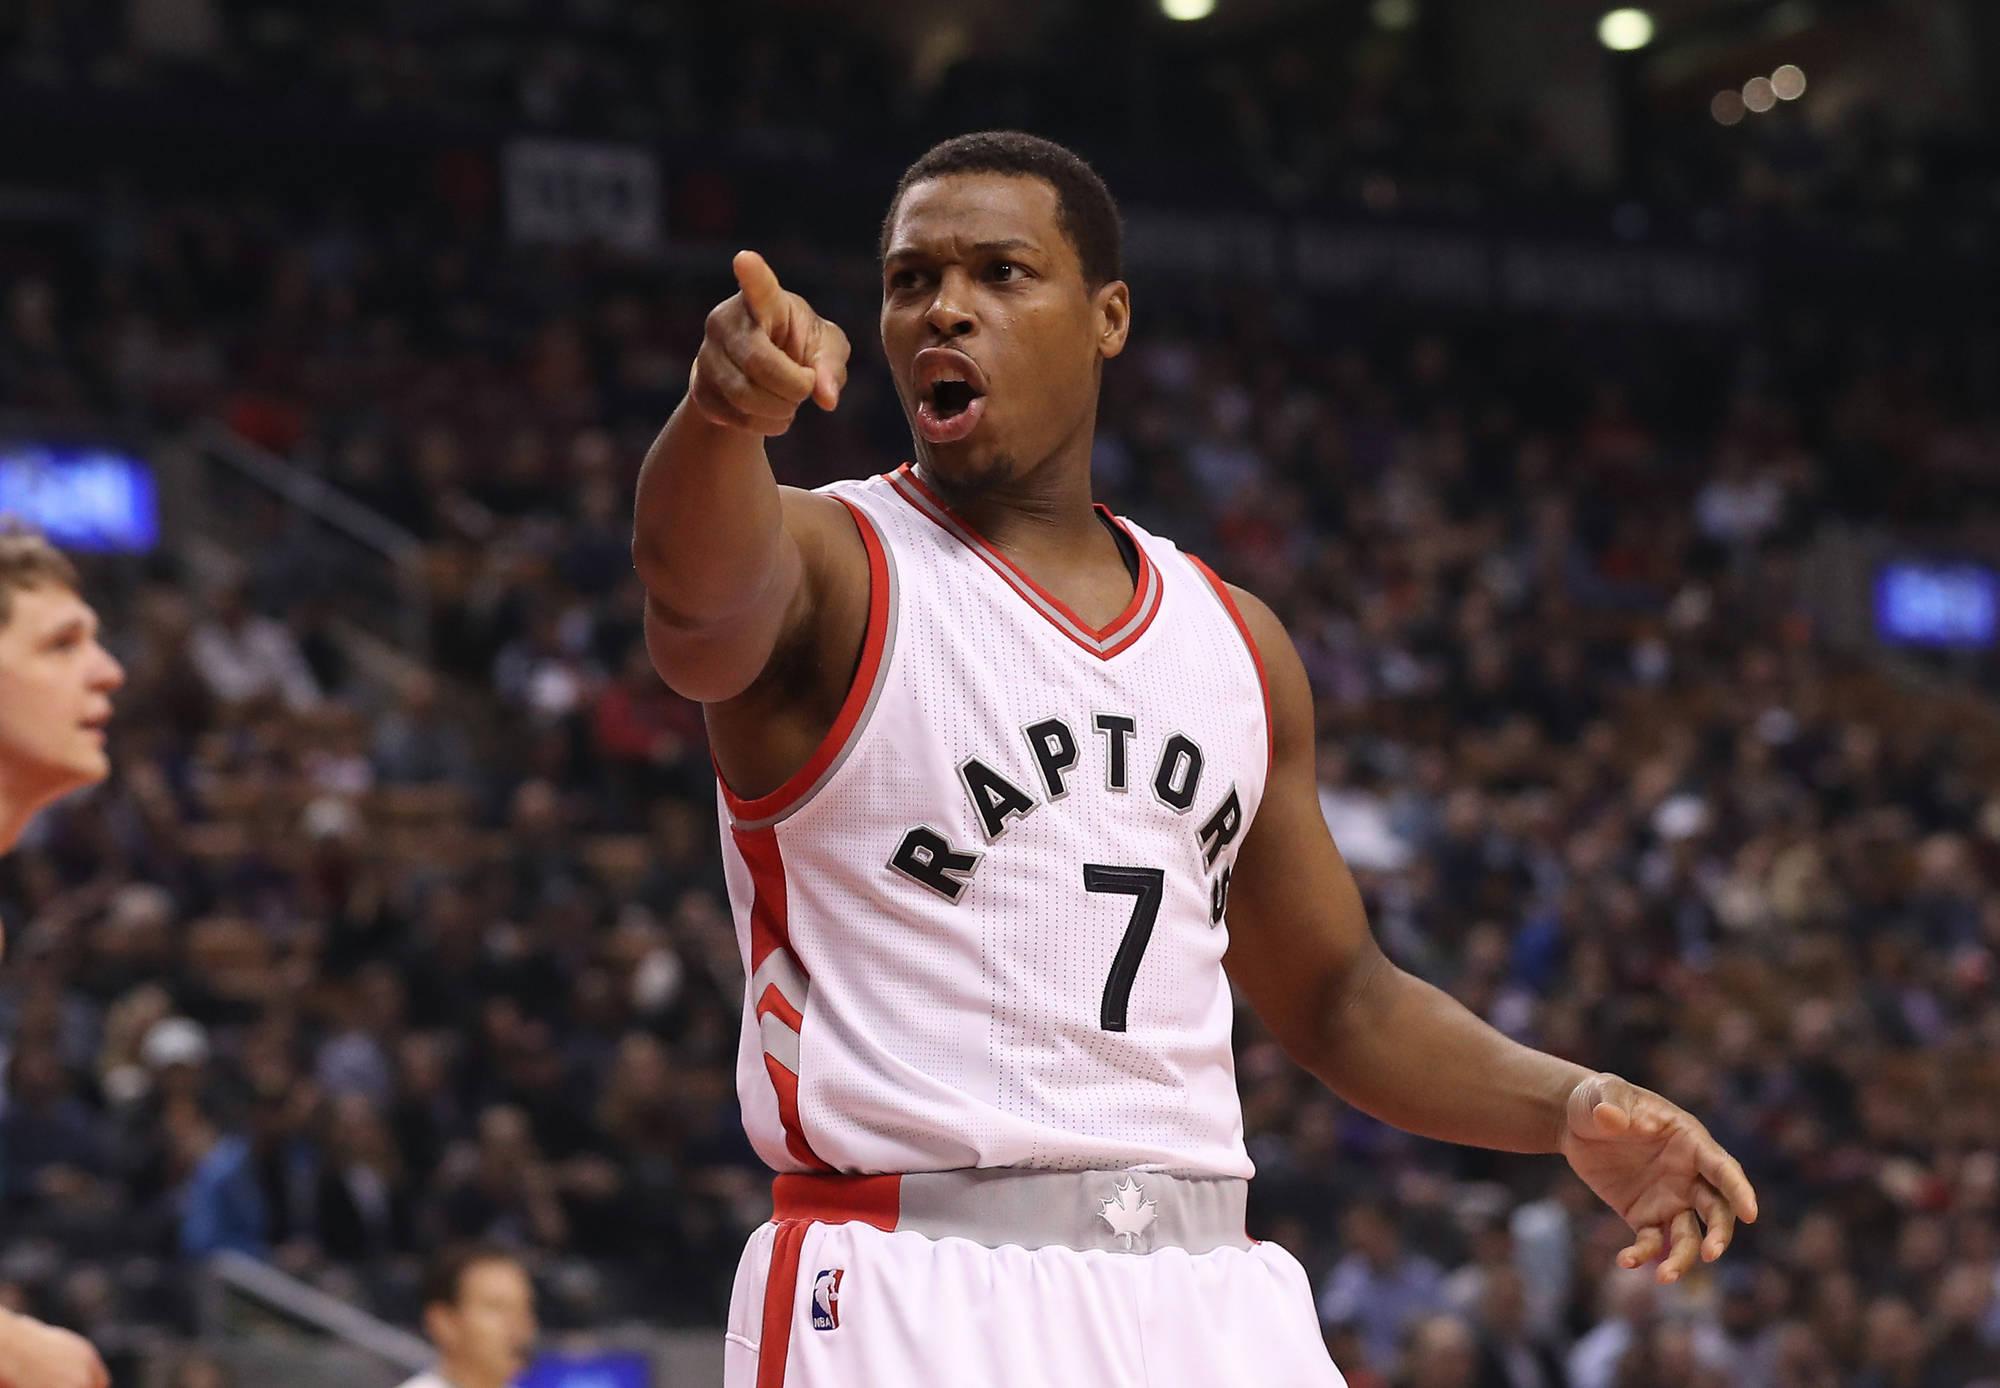 Toronto Raptors demolish the Atlanta Hawks, make franchise history